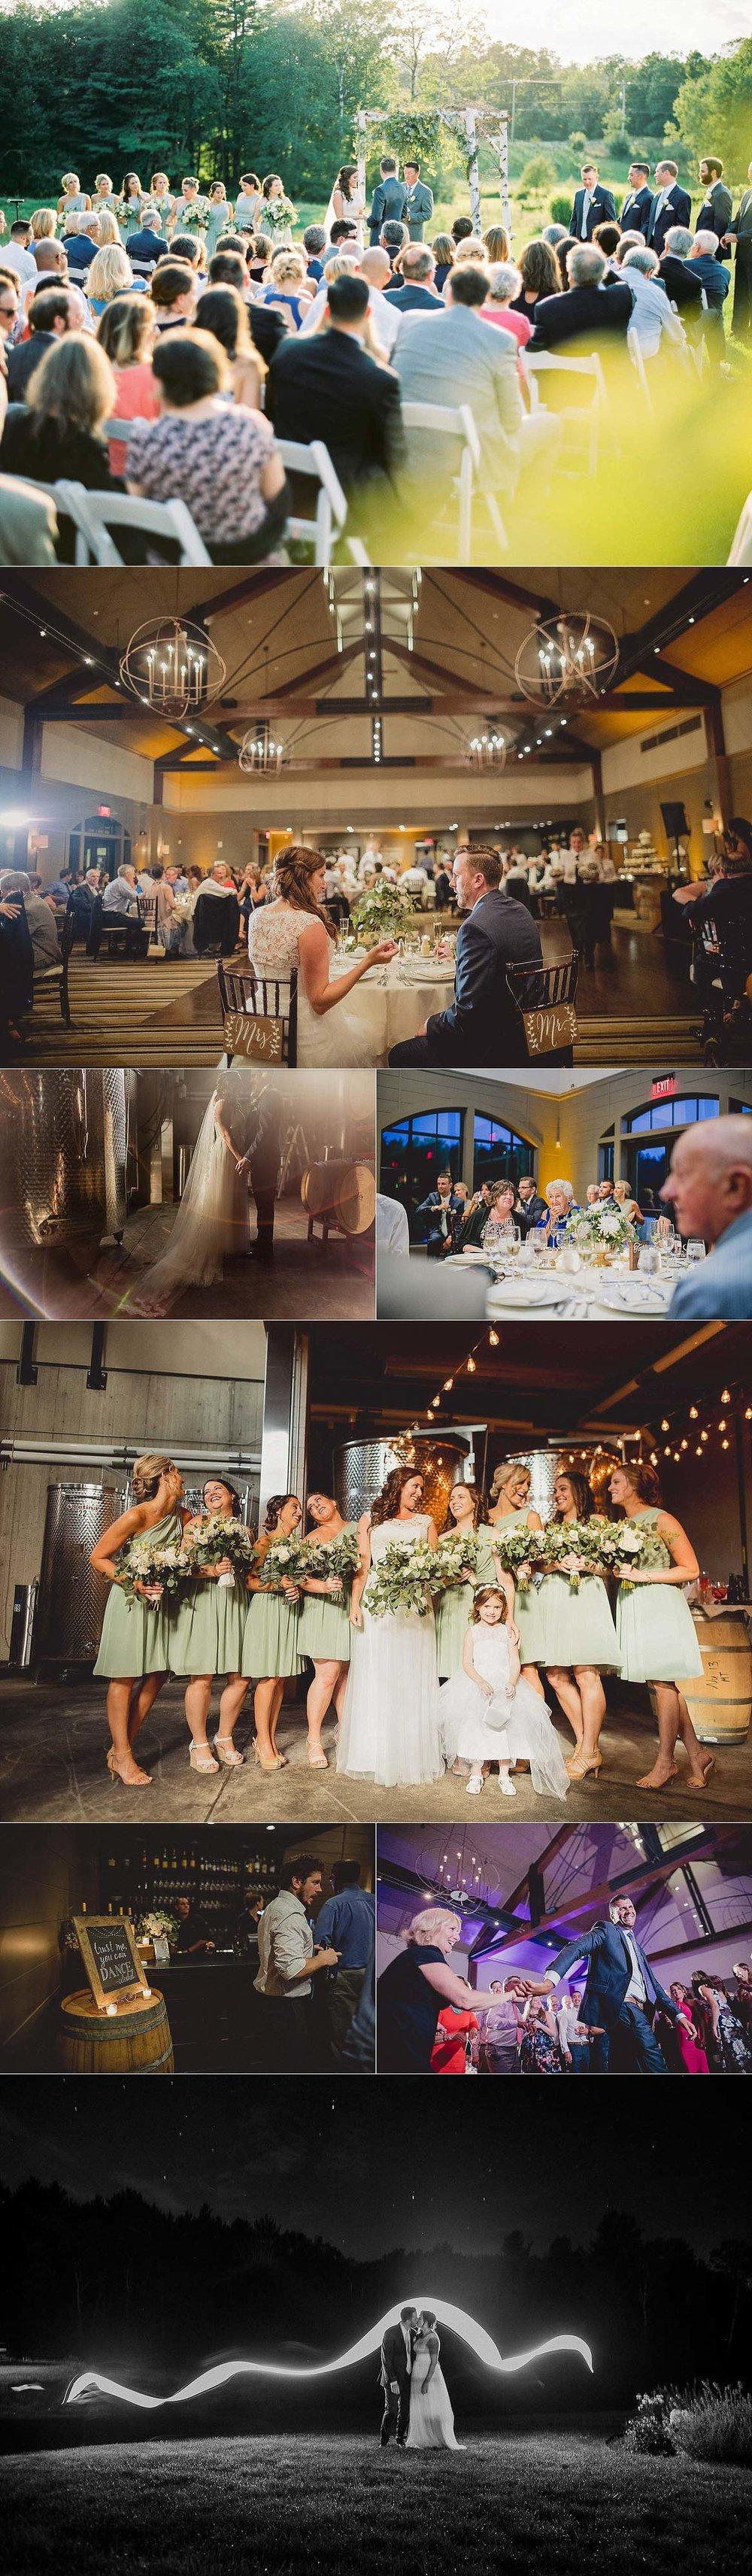 LeBelle Winery Wedding-11.jpg